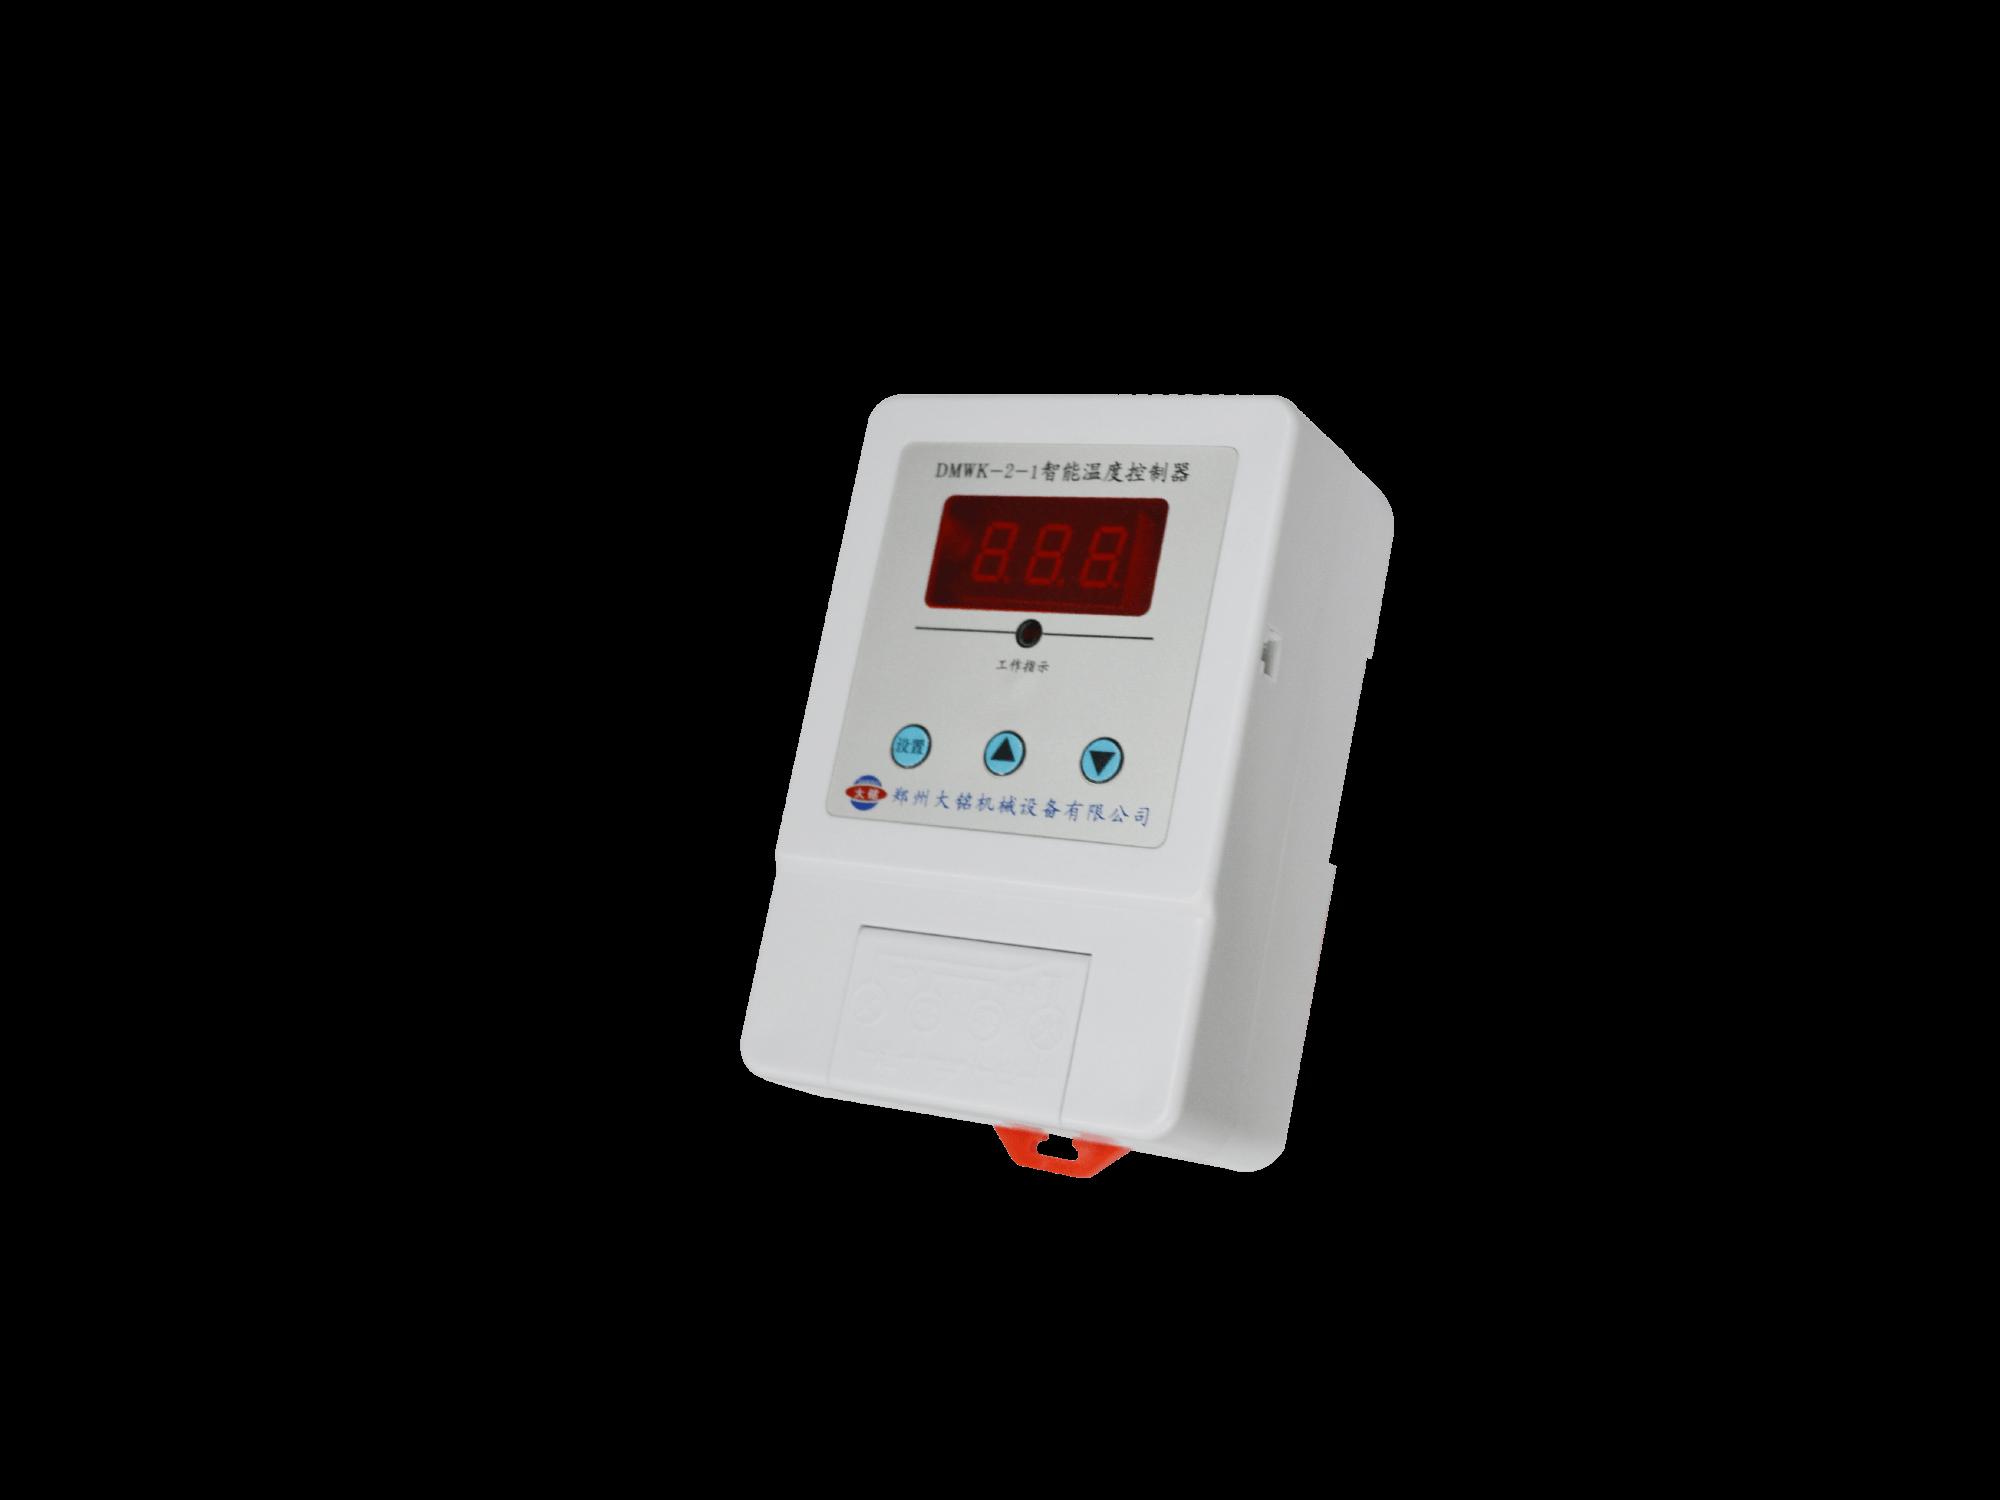 DMWK-2-1型温控开关